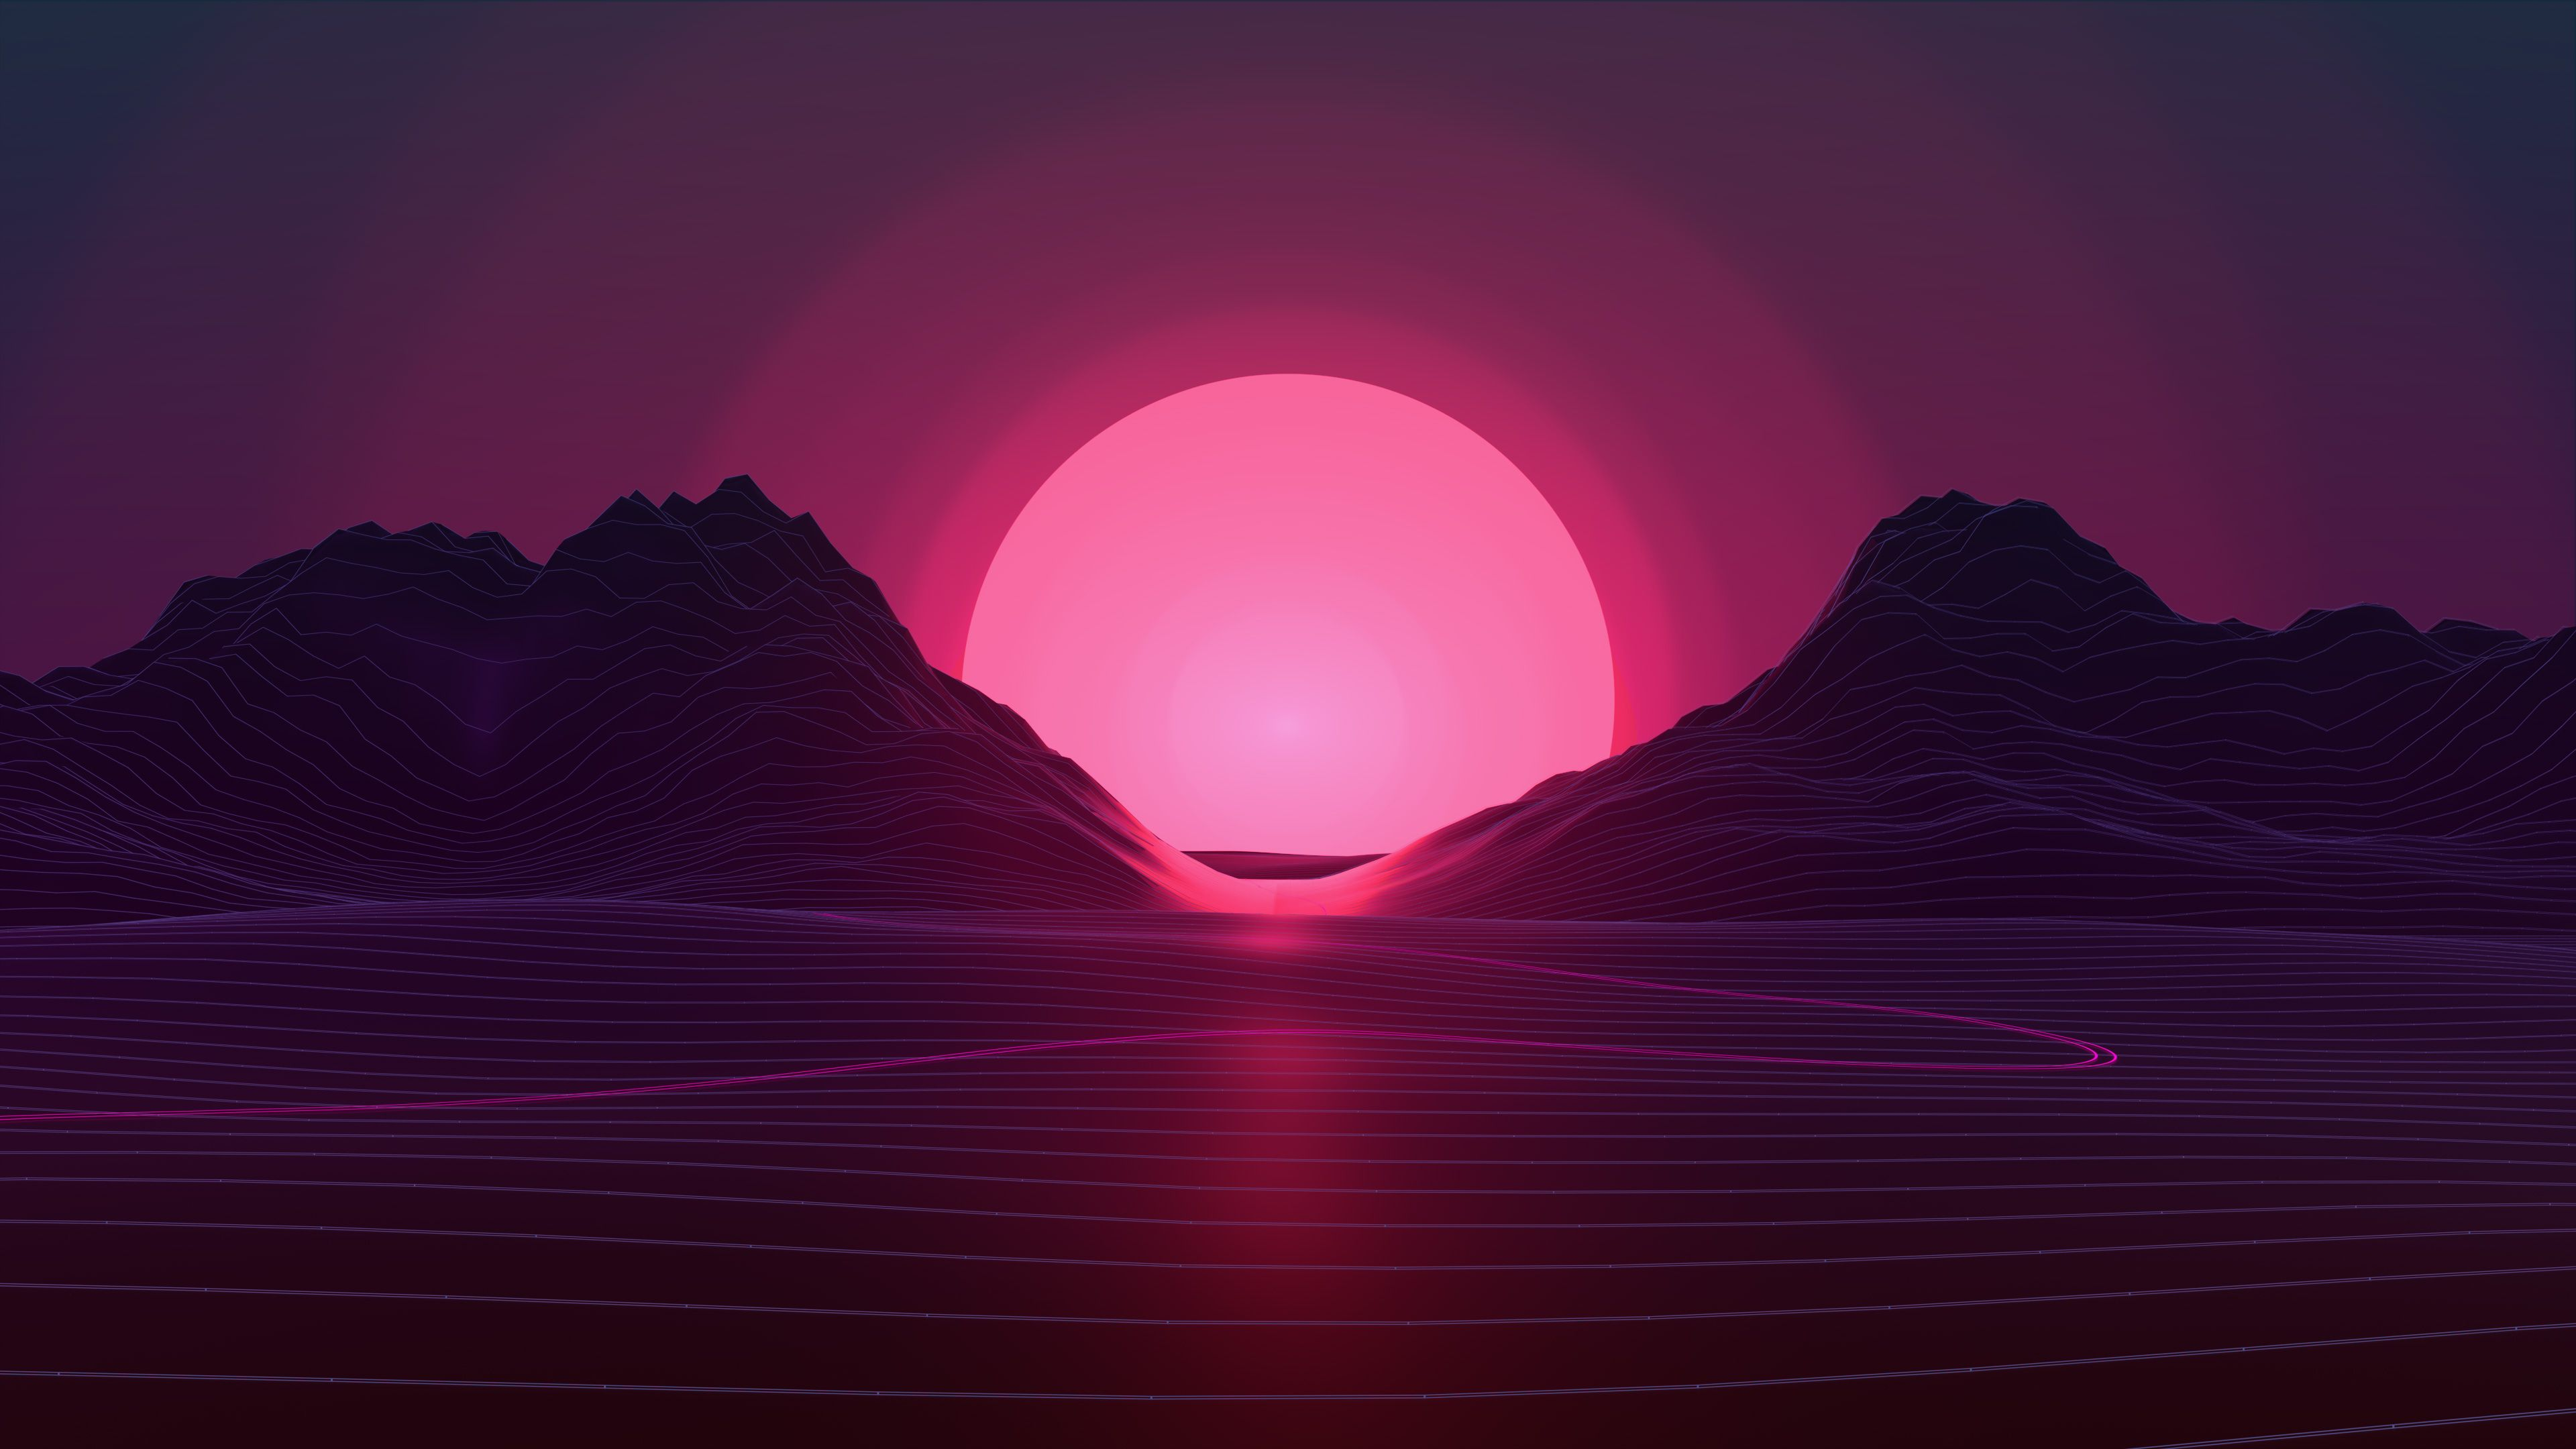 3840x2160 Neon Sunset 4k 2048x1152 Độ phân giải HD Hình nền 4k